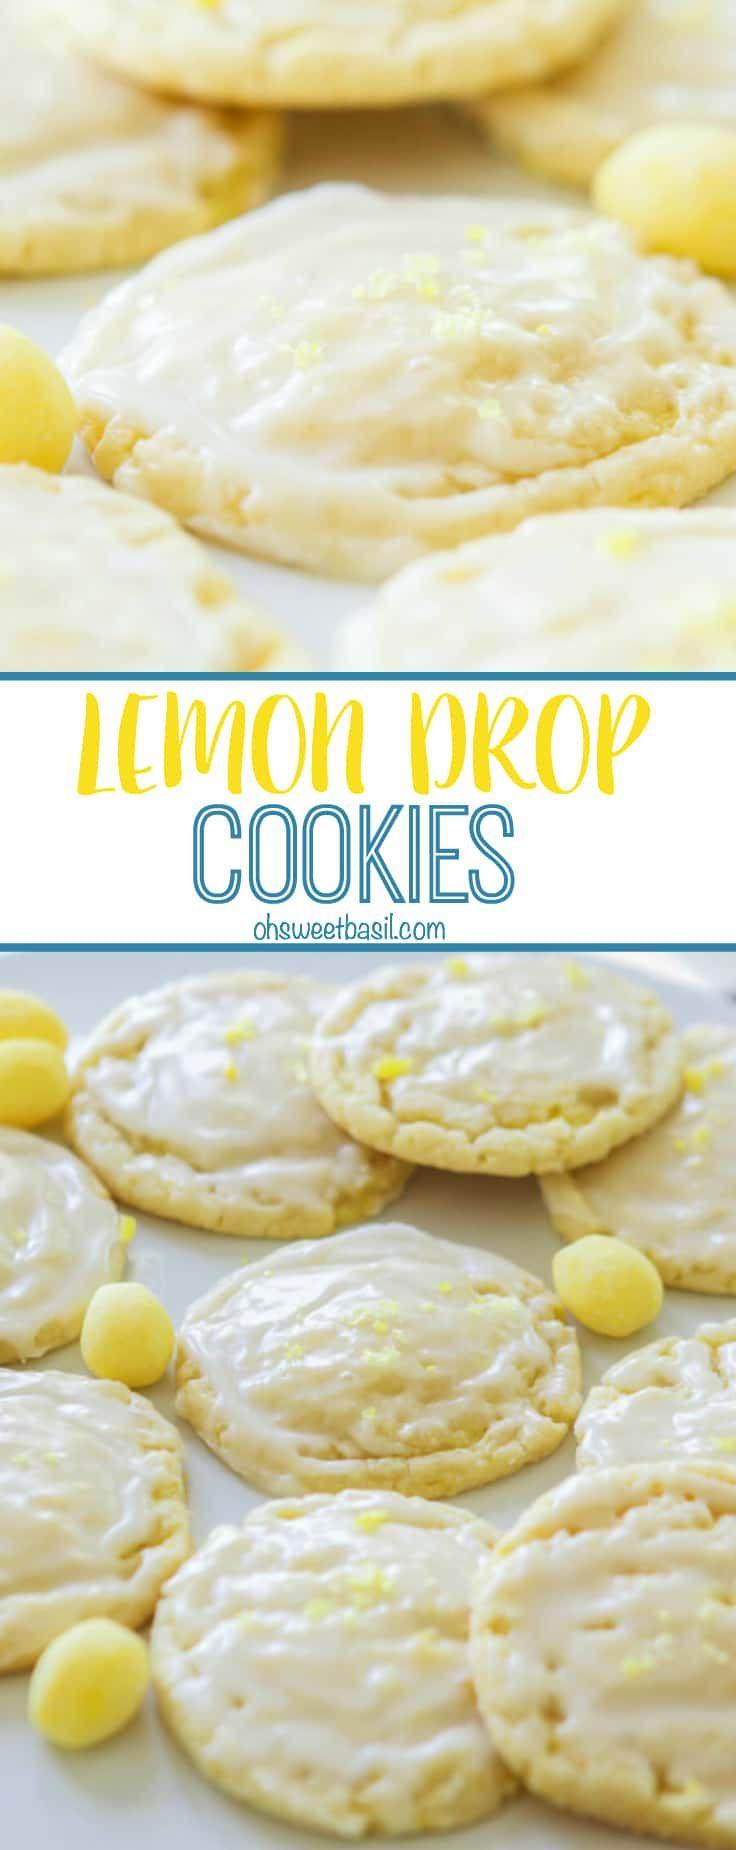 1702 best cookies bars squares images on pinterest for Food52 lemon bar